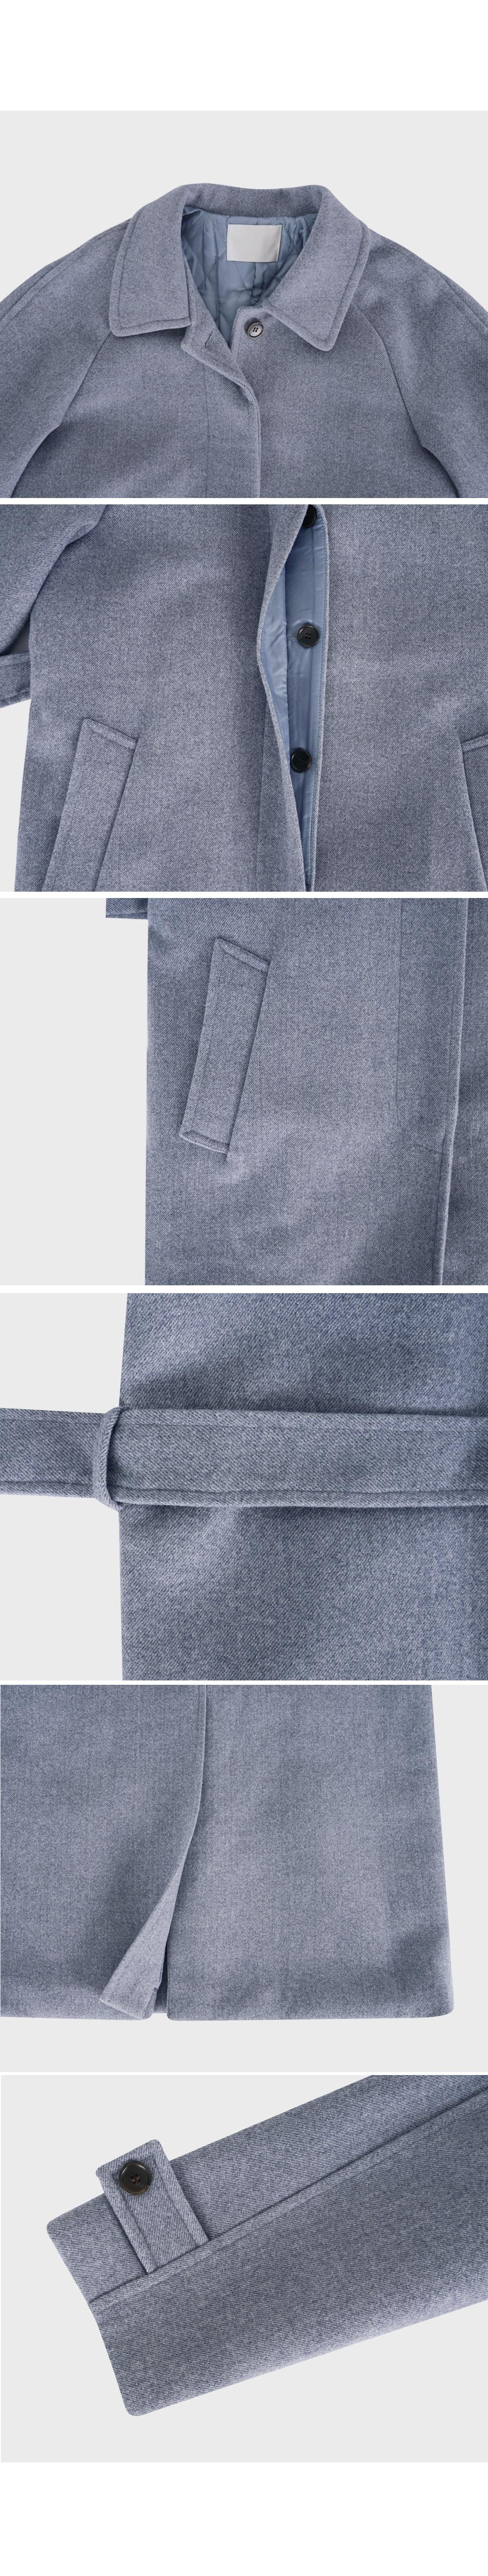 Tone Down Single Wool Coat-holiholic.com